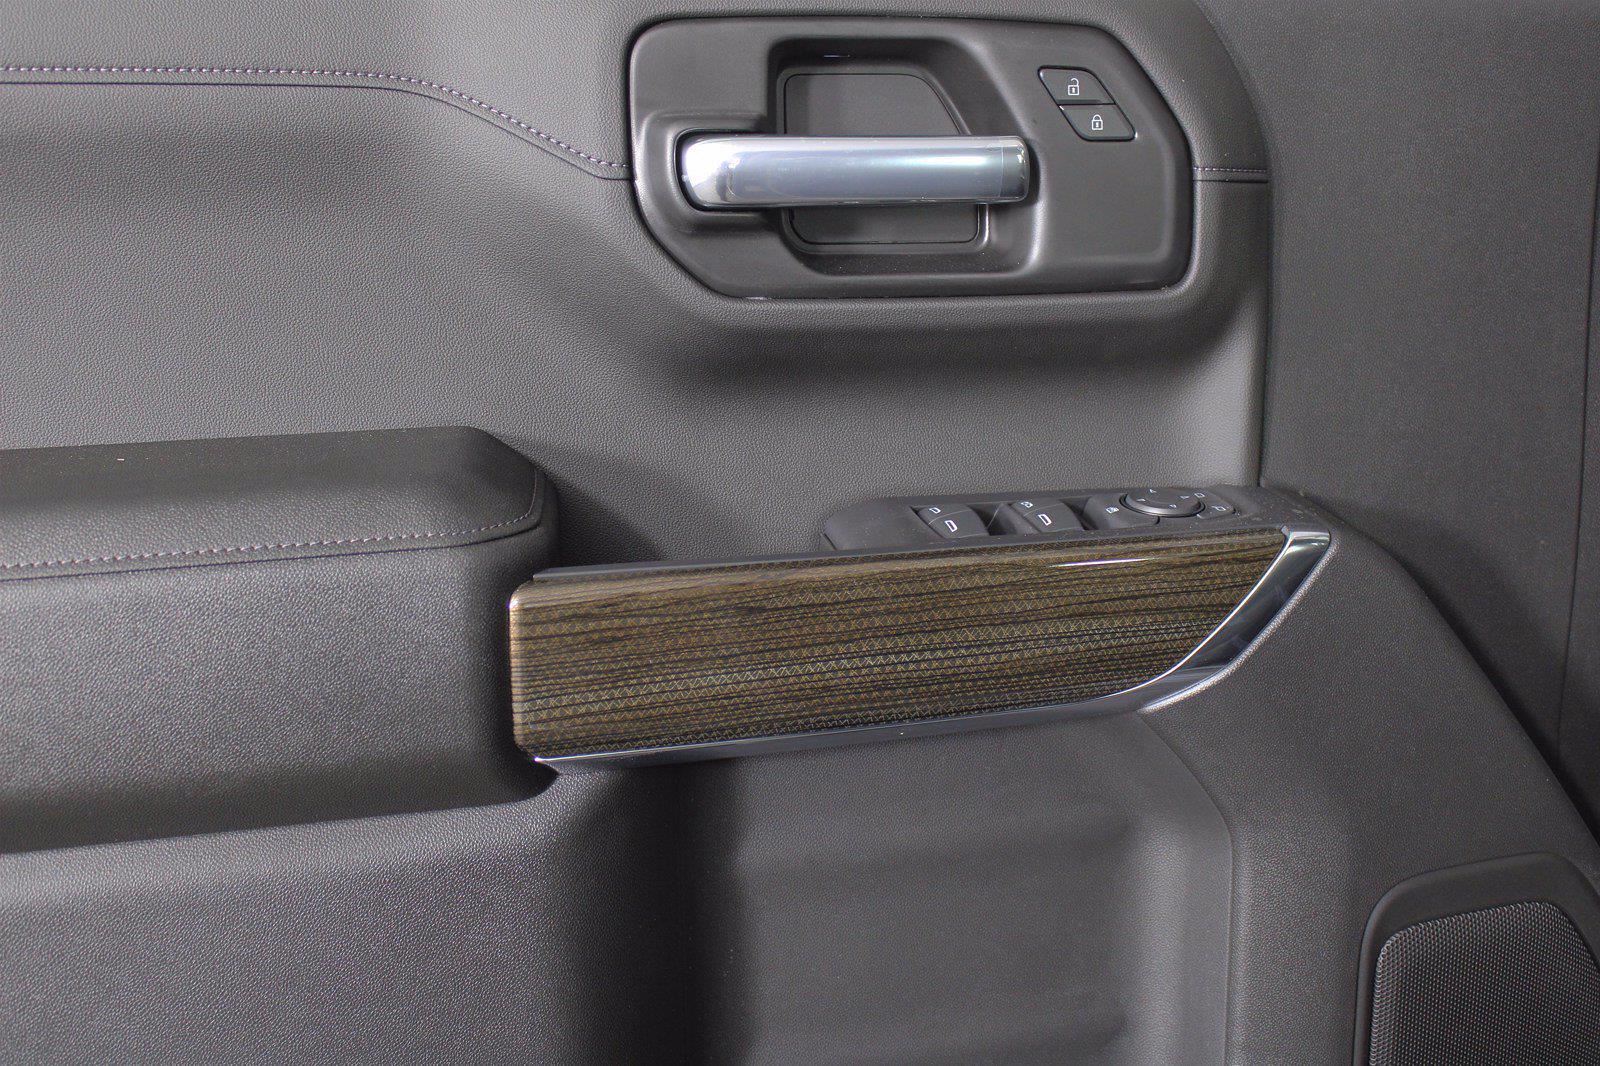 2021 Chevrolet Silverado 1500 Crew Cab 4x4, Pickup #D111114 - photo 10